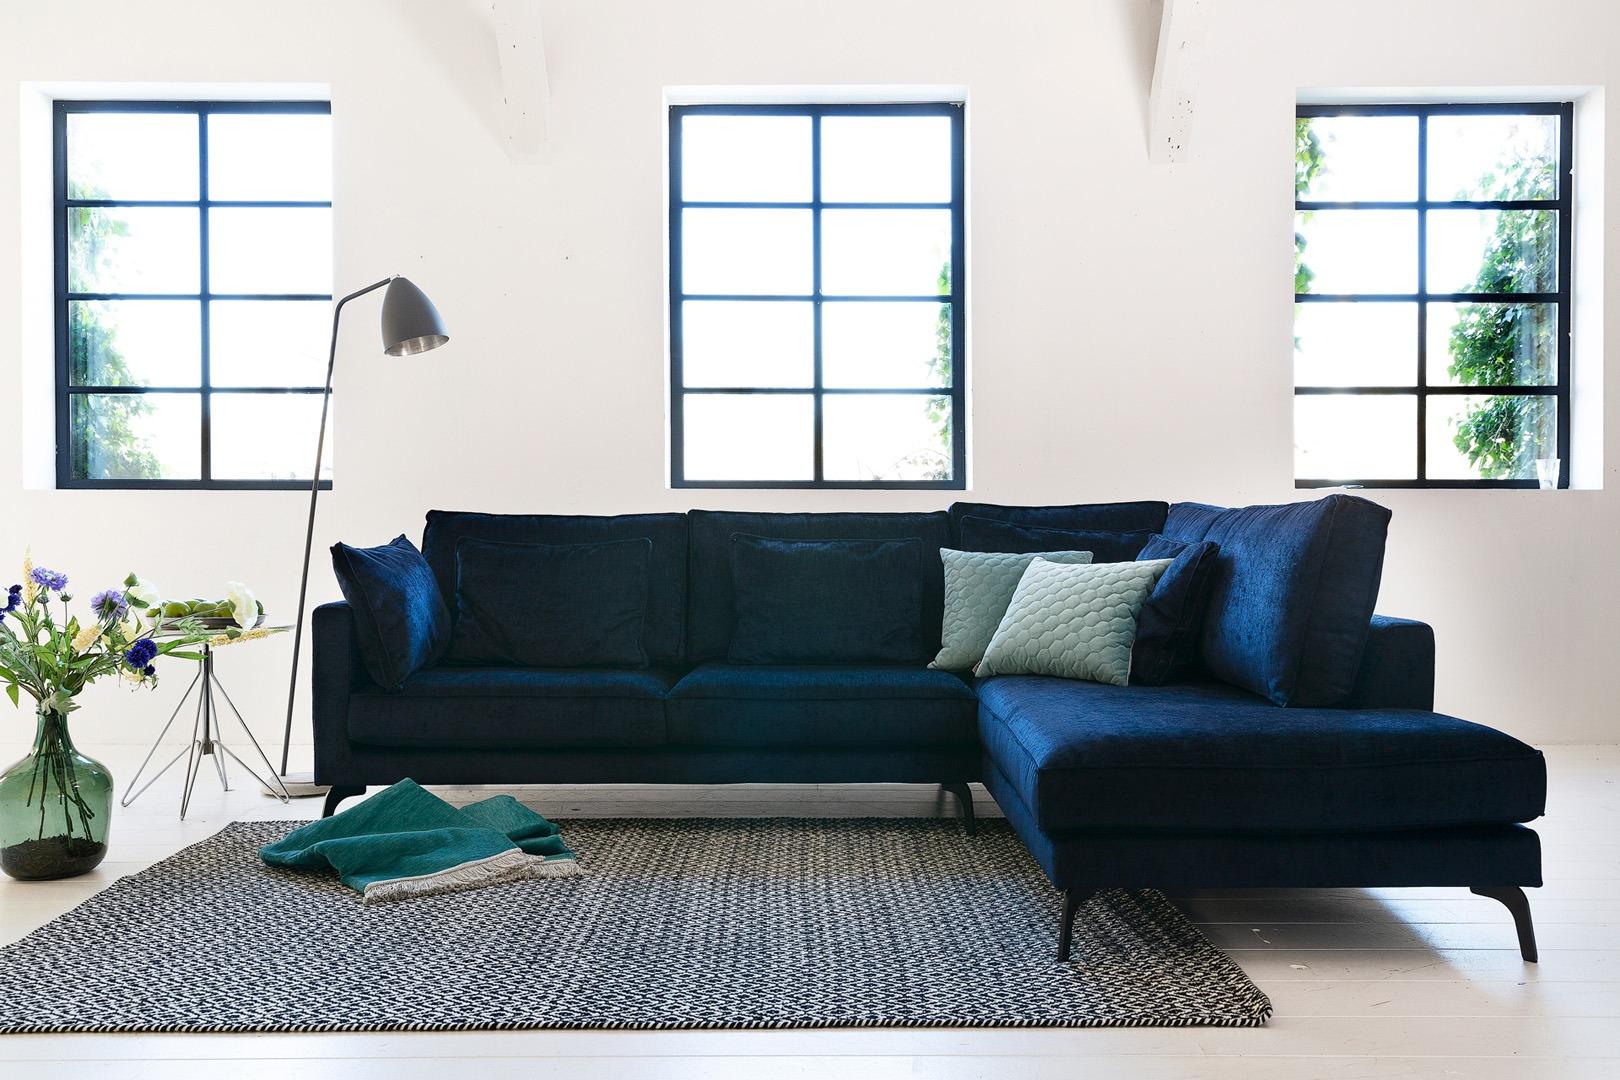 haveli-dreams-hoekbank-ottoman-blauw-stof-soofs-interieur-1- (1)